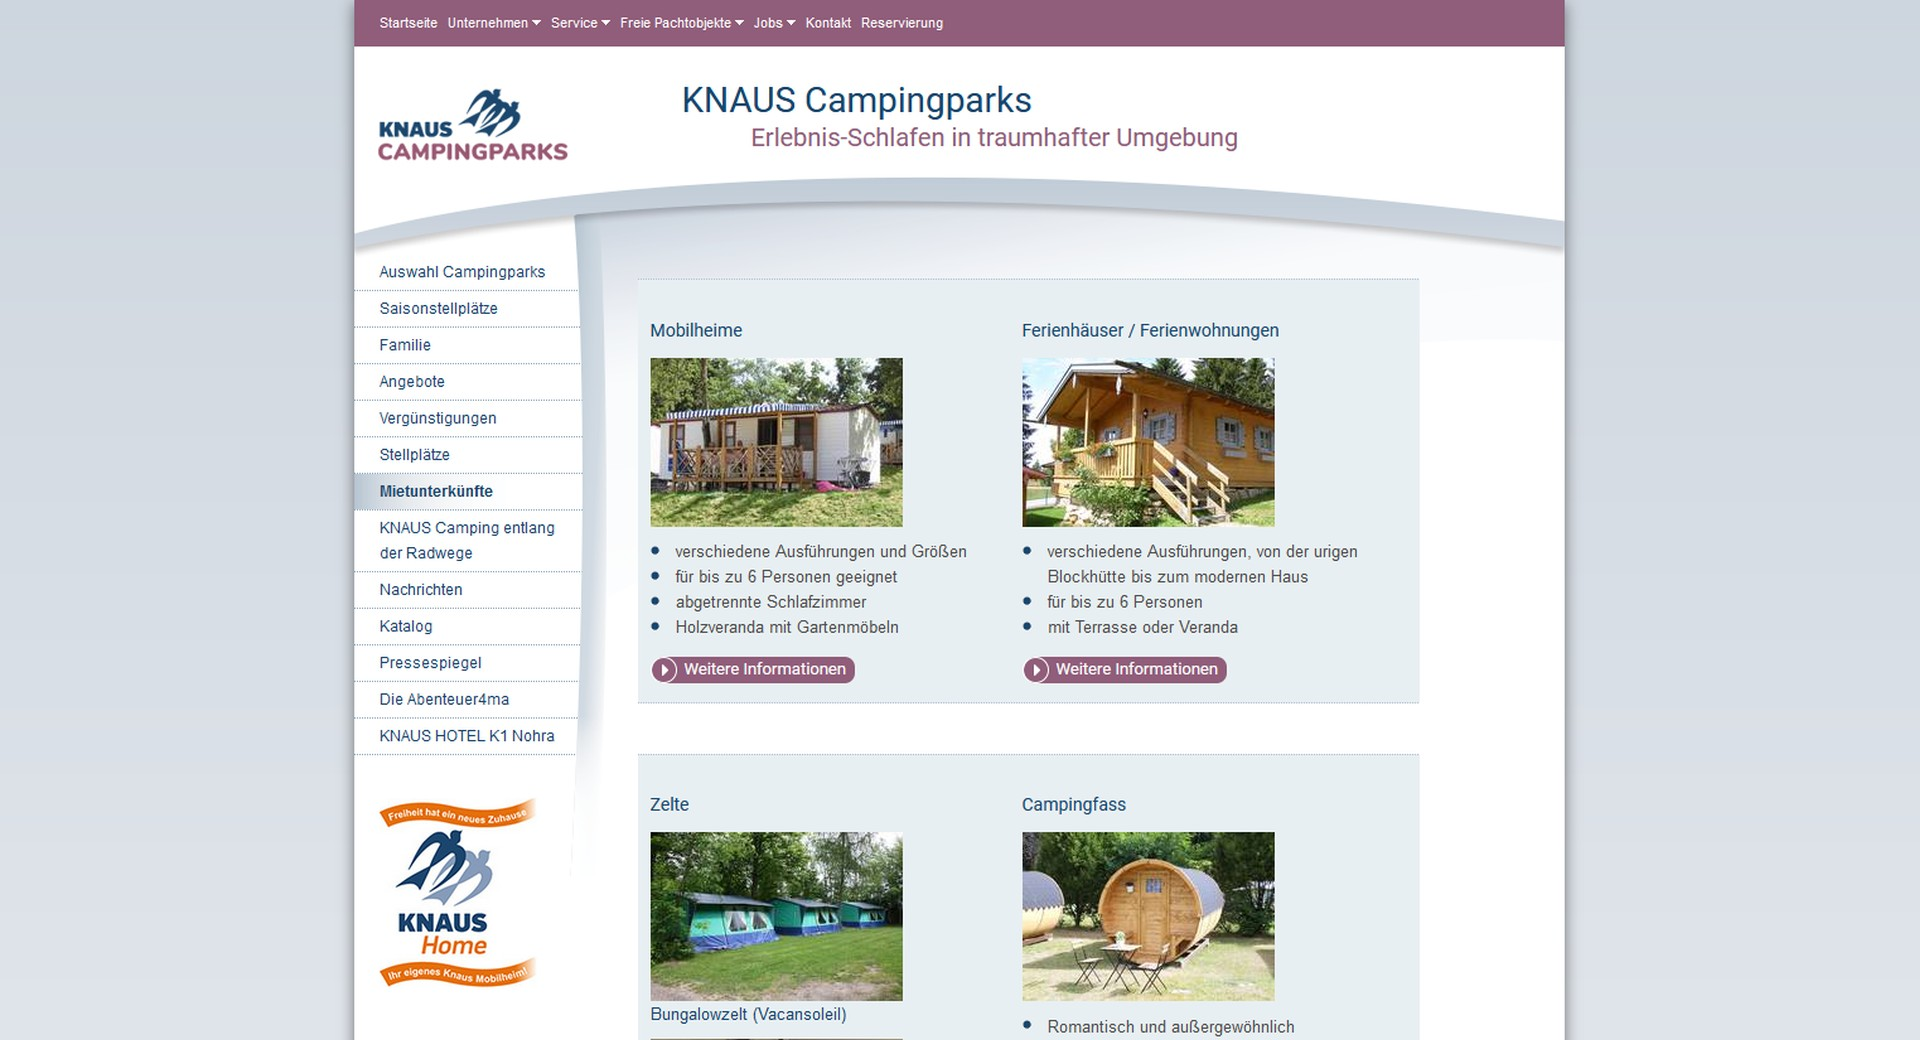 KNAUS Campingpark